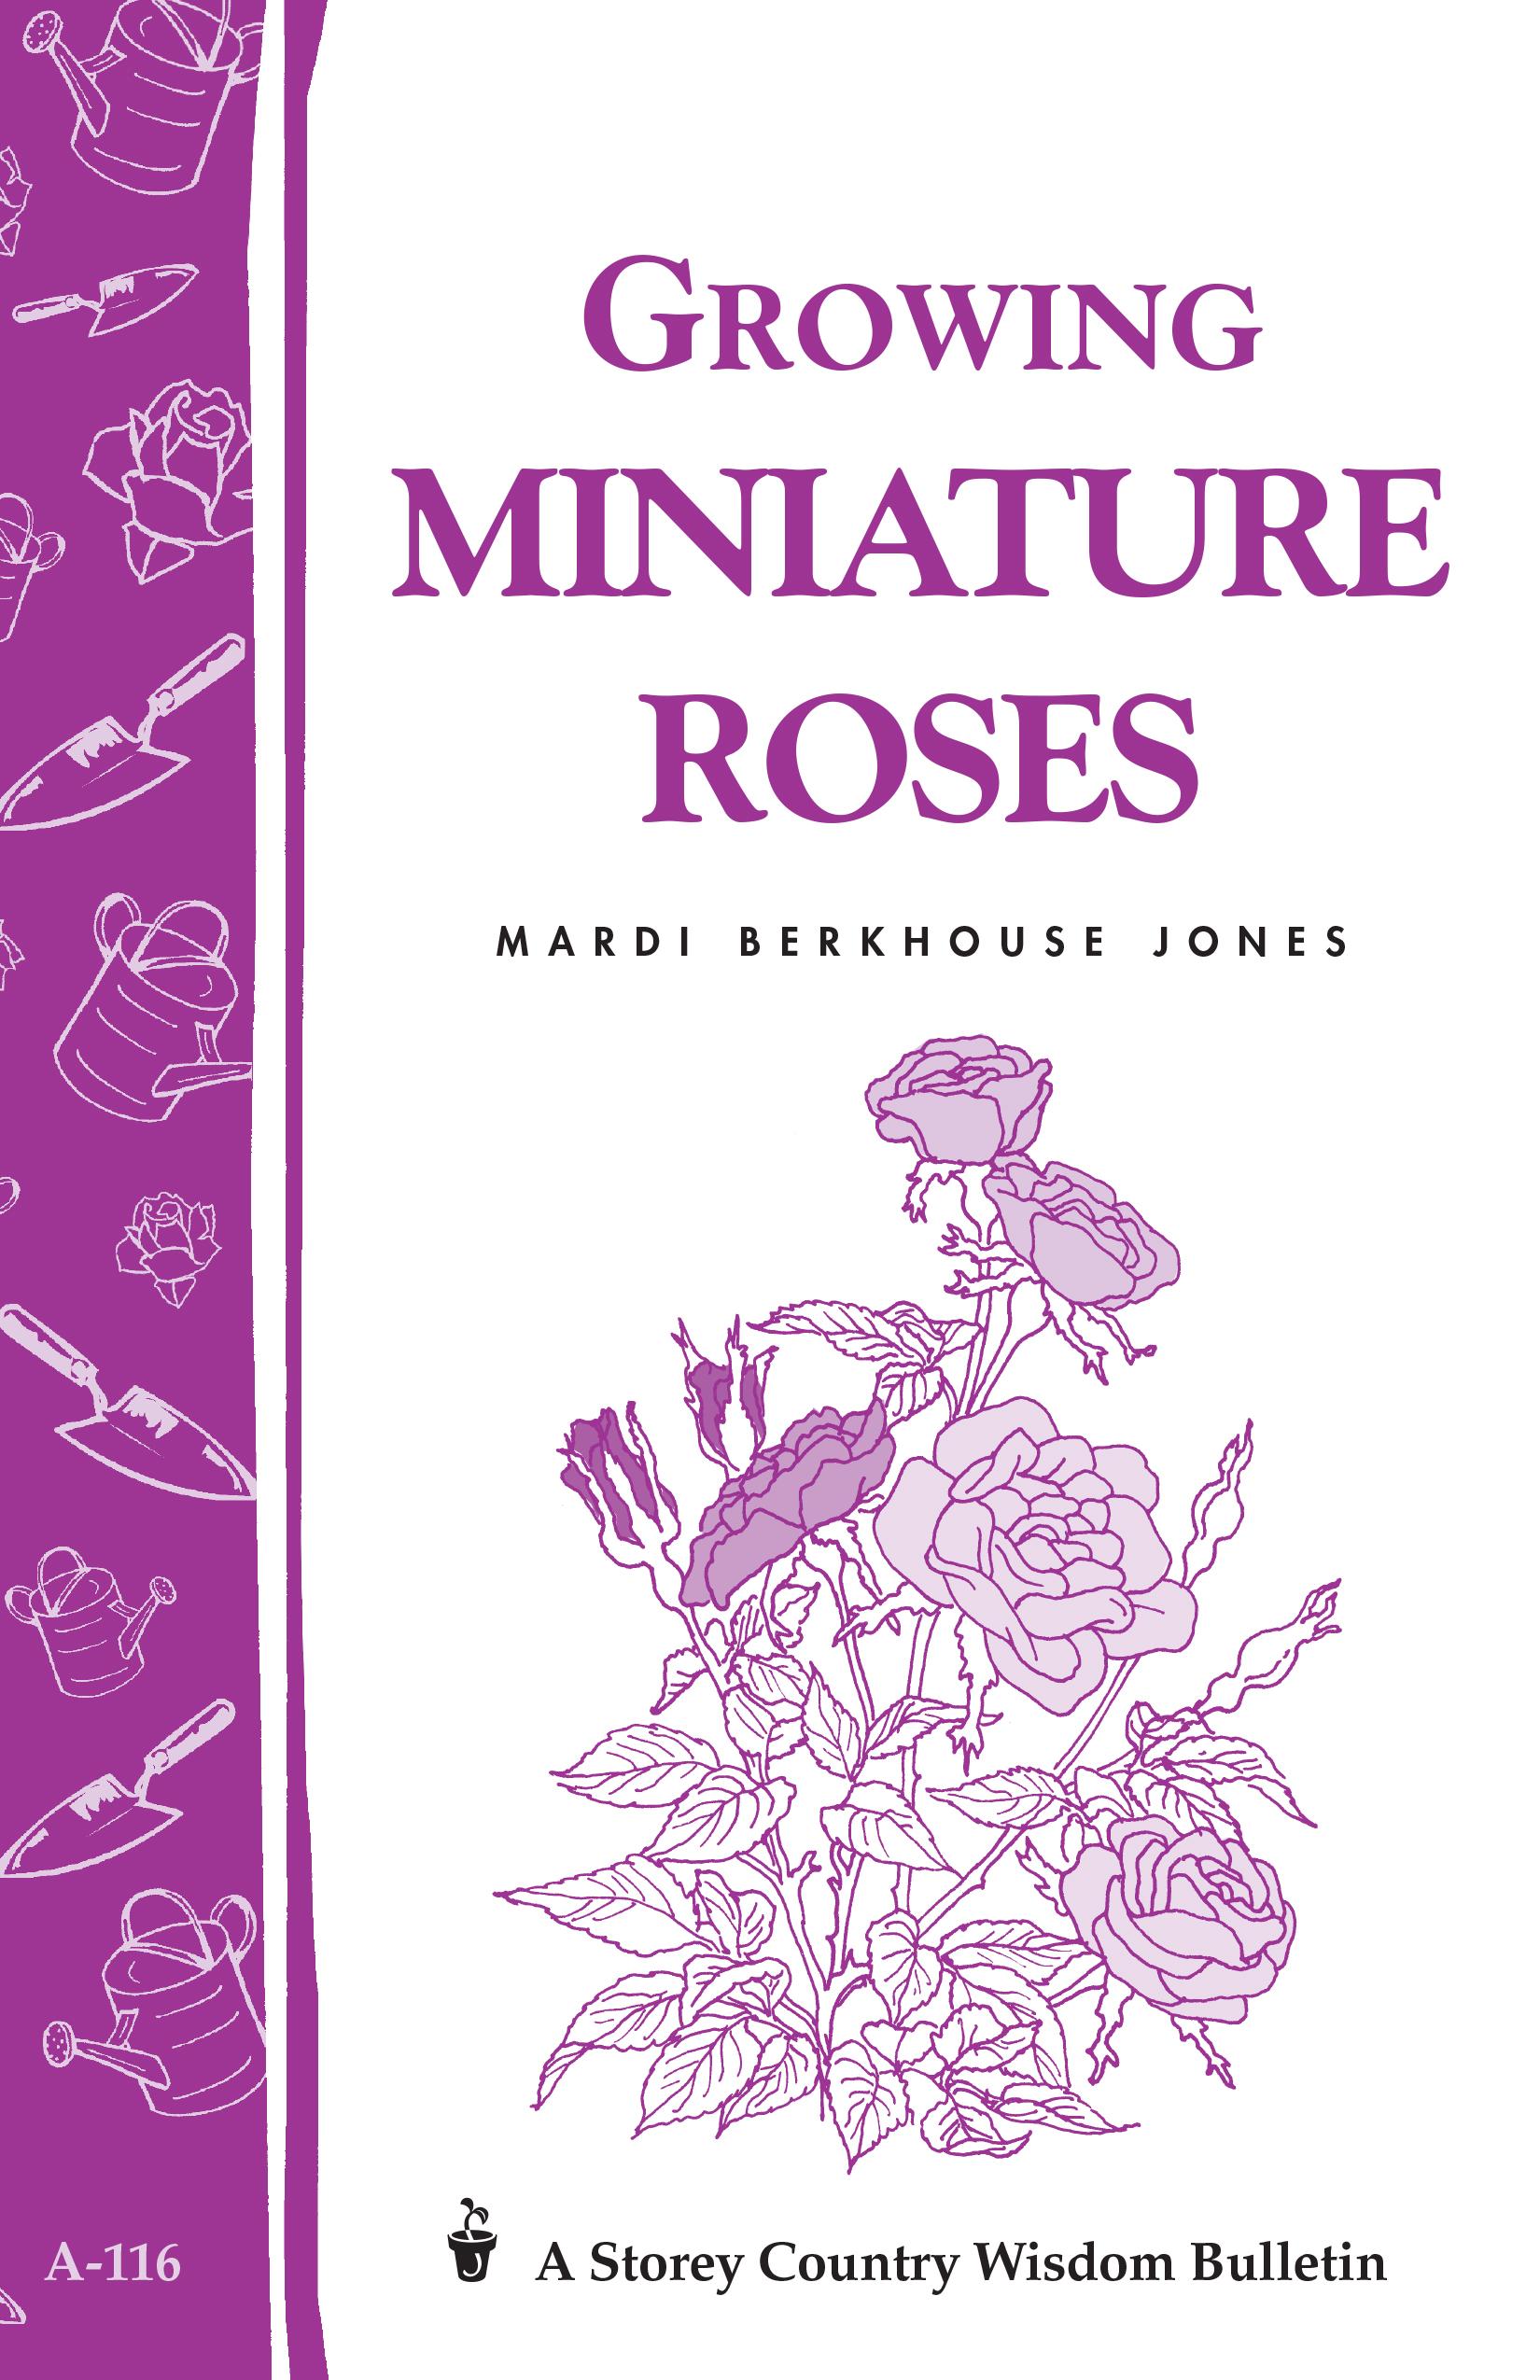 Growing Miniature Roses Storey's Country Wisdom Bulletin A-116 - Mardi Berkhouse Jones